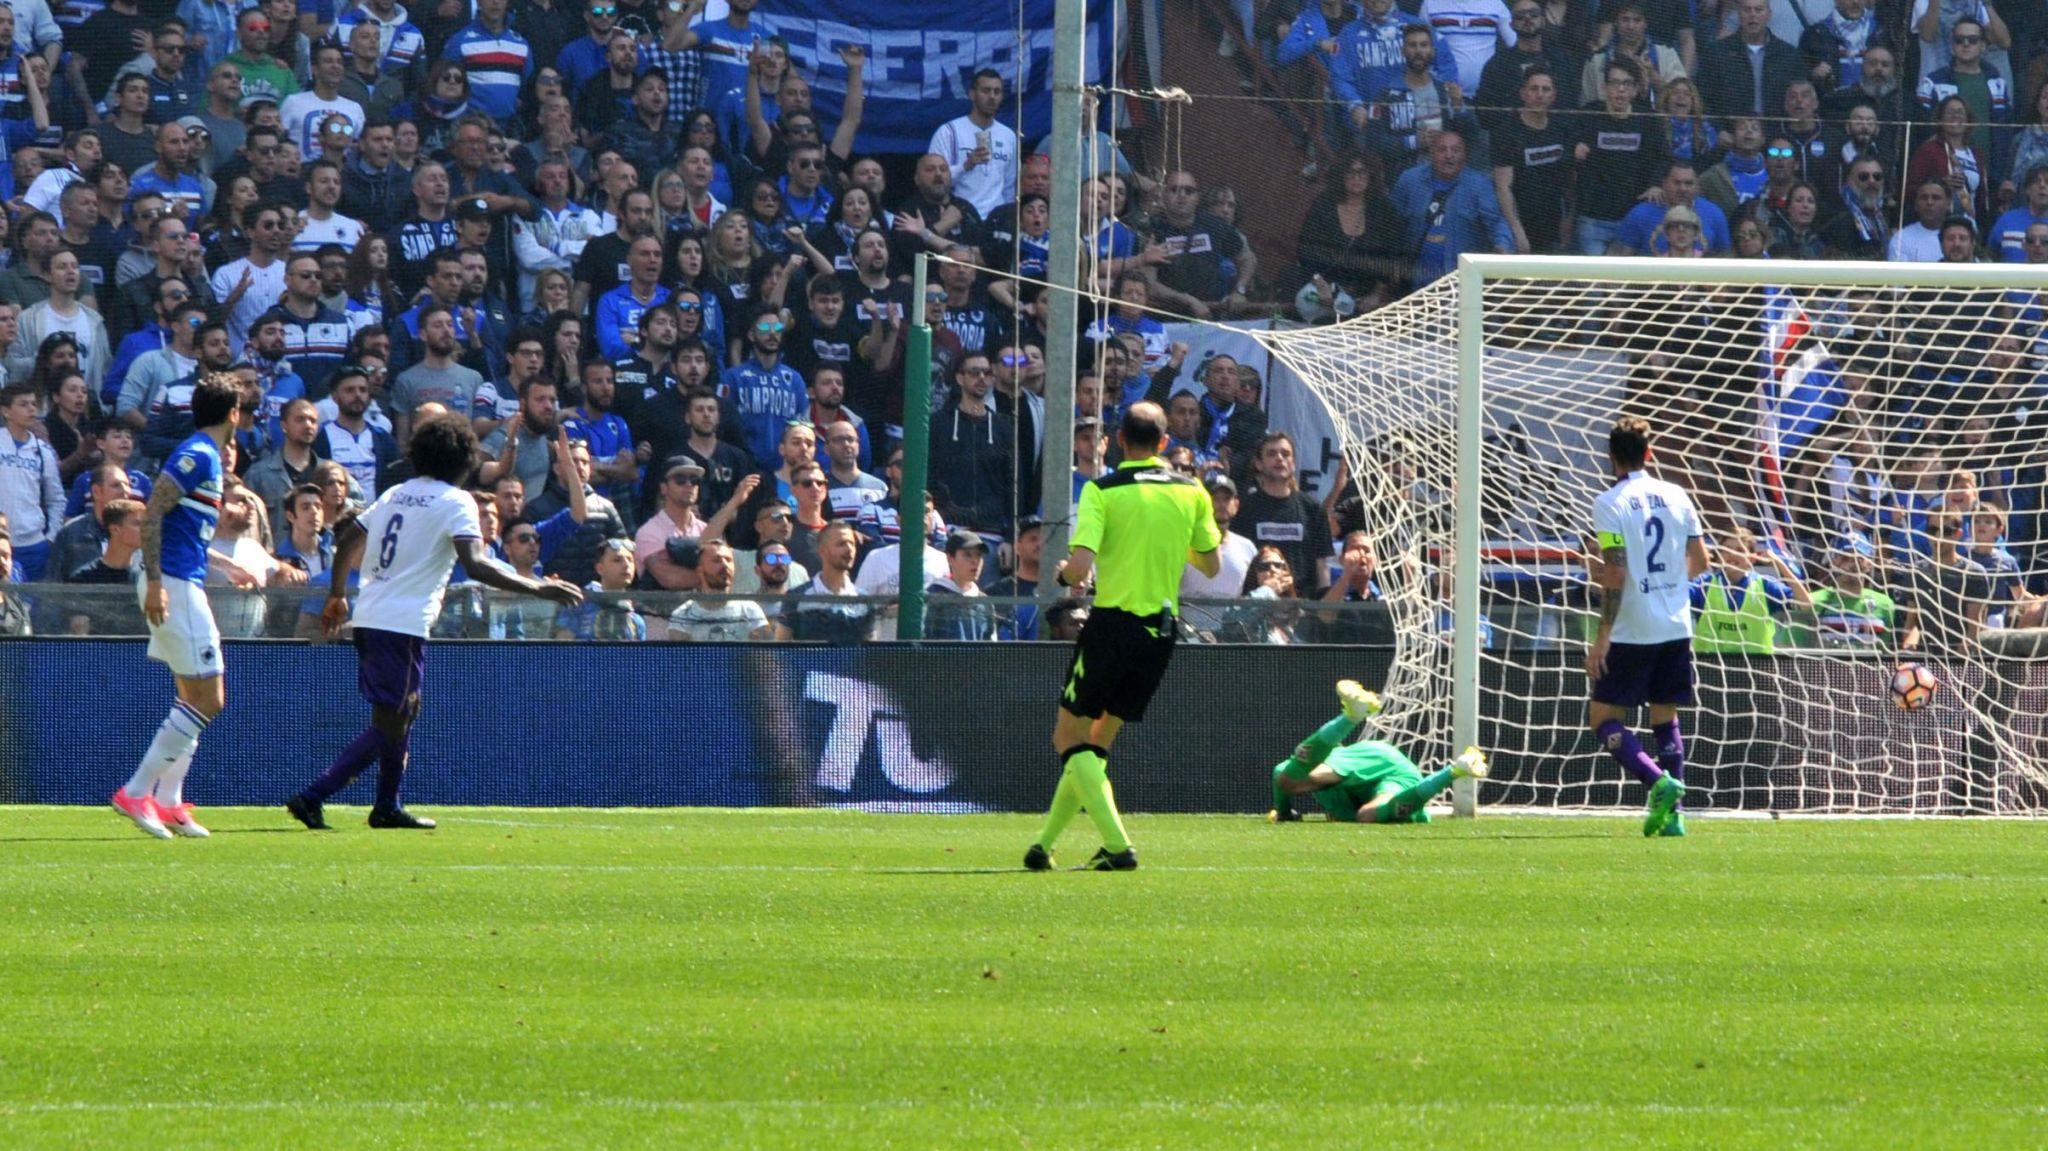 Sampdoria Alvarez